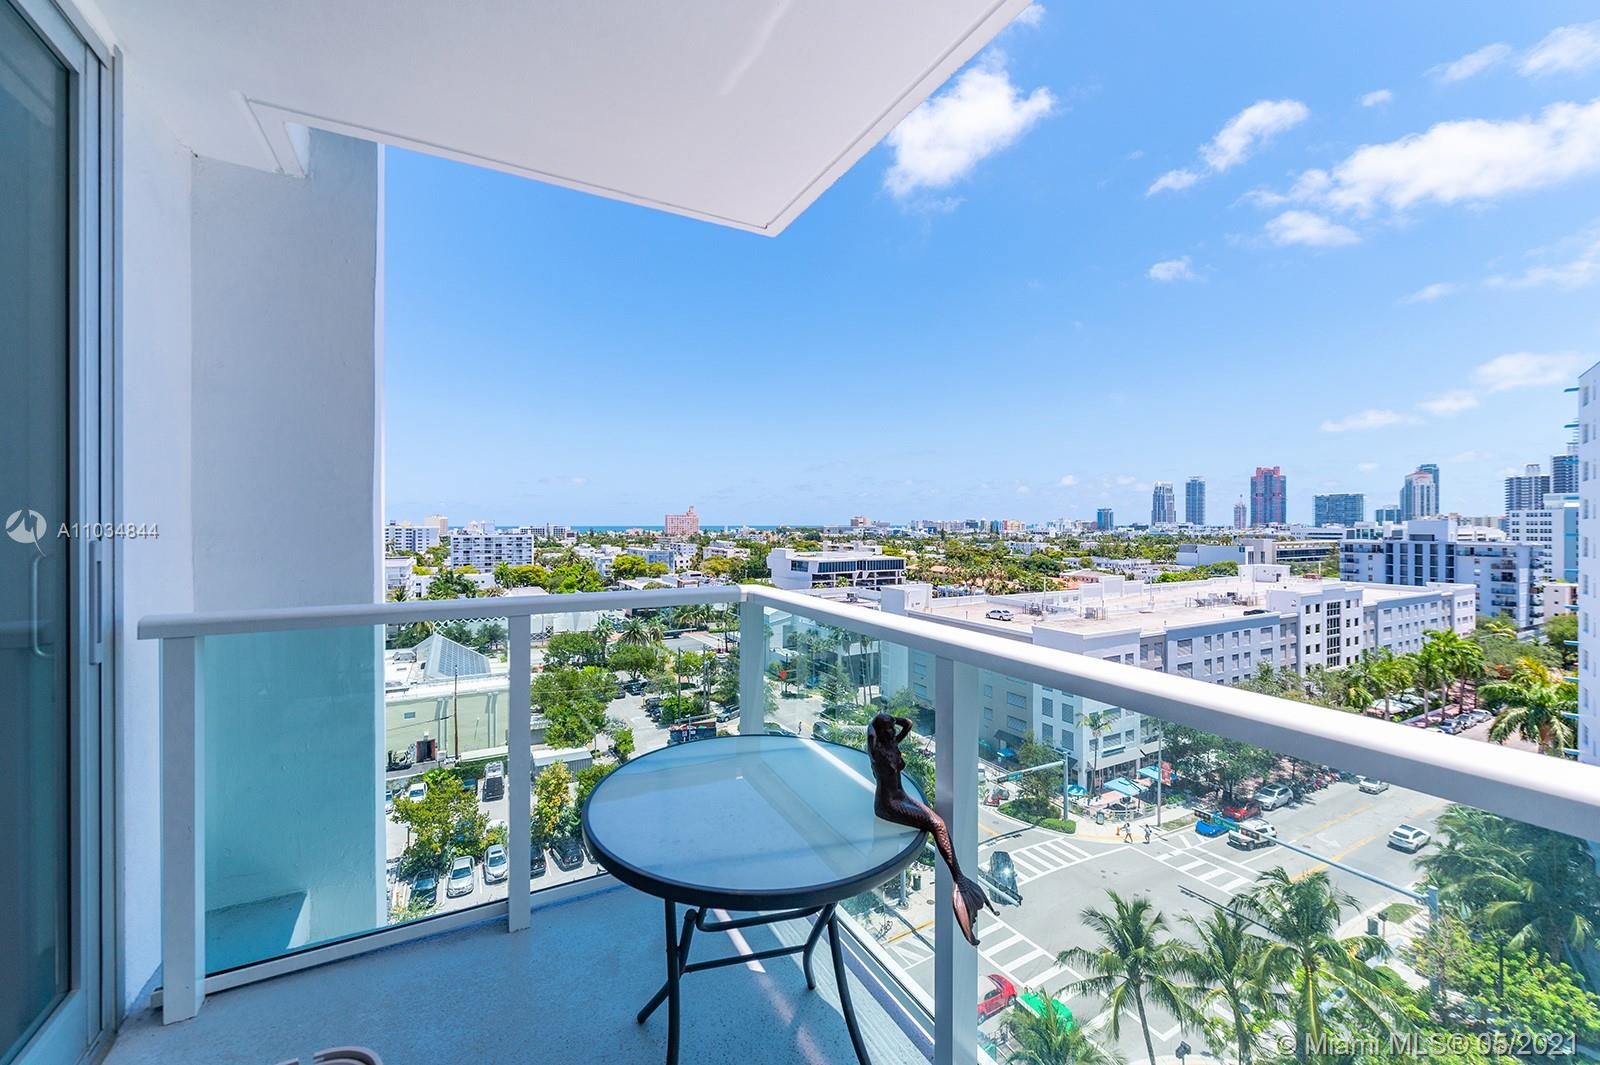 Mirador South #1002 - 1000 West Ave #1002, Miami Beach, FL 33139